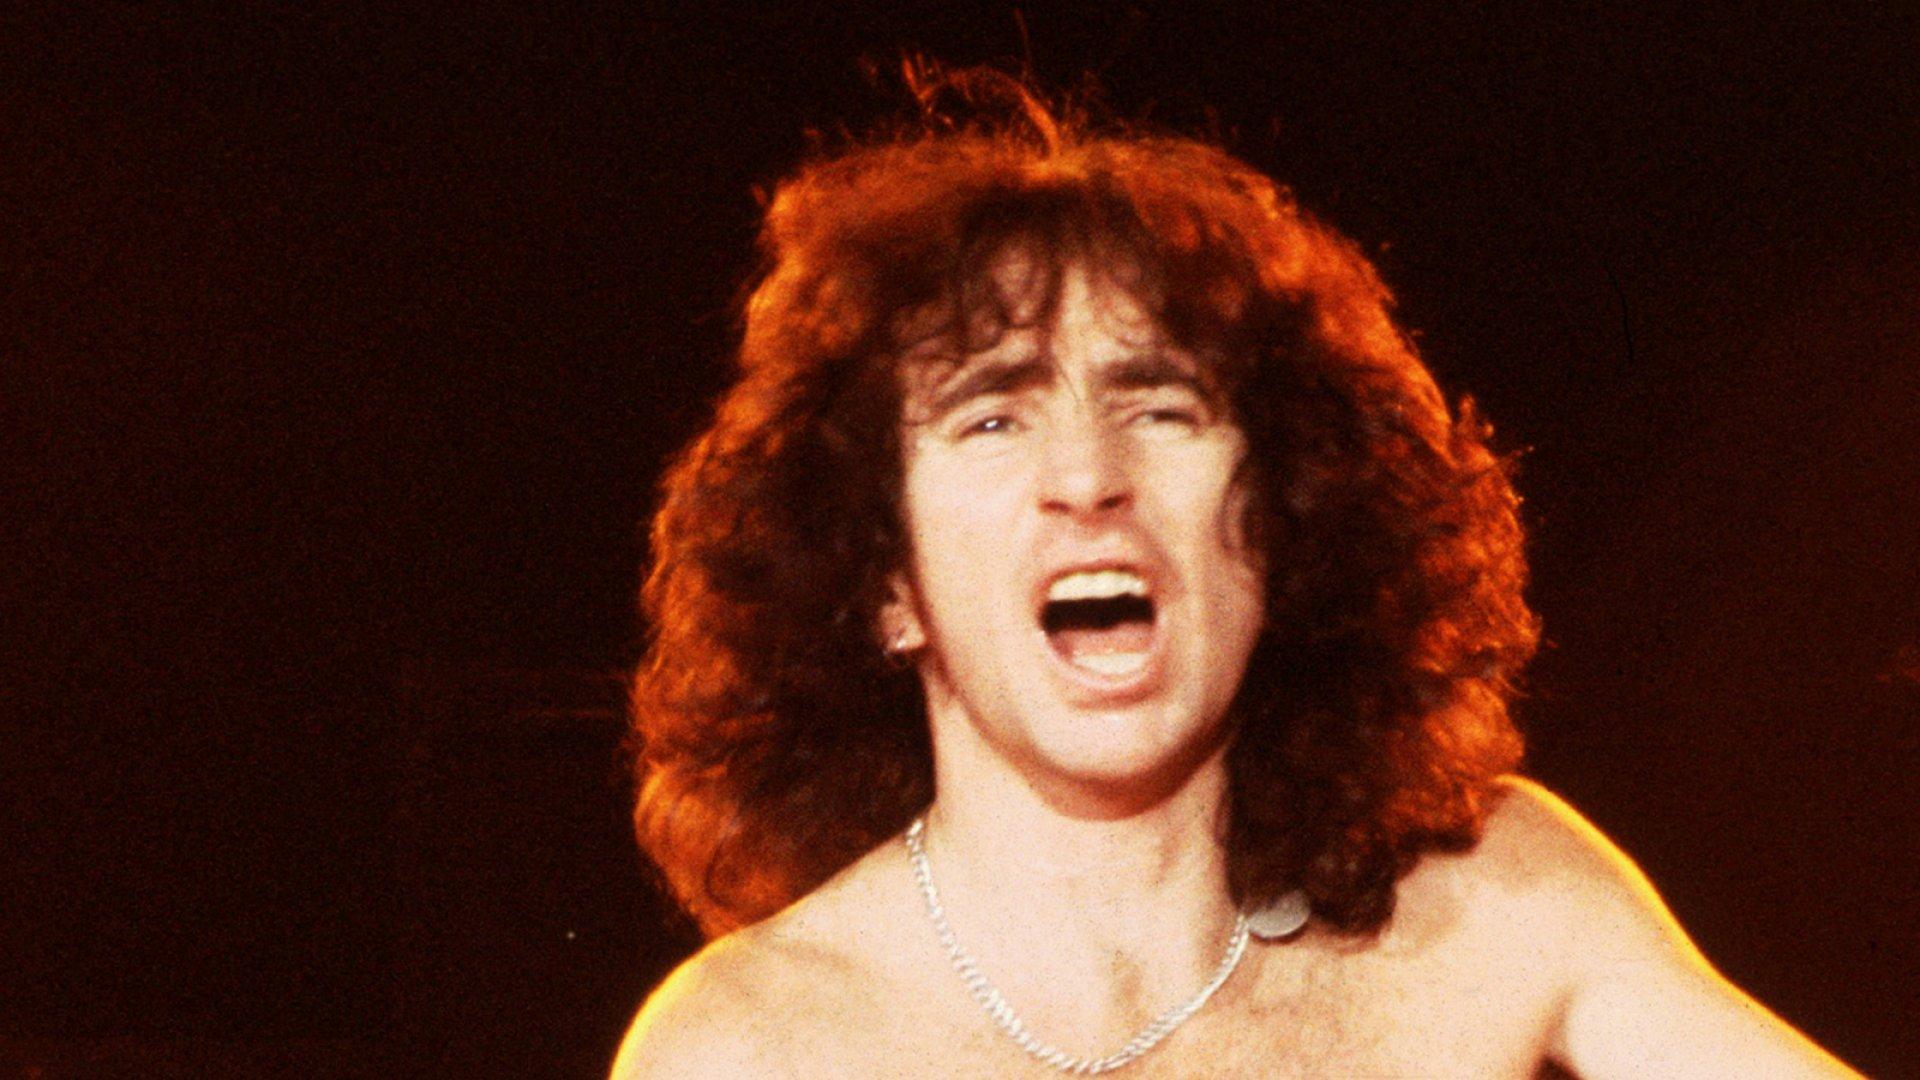 AC/DC singer Bon Scott in 1976.